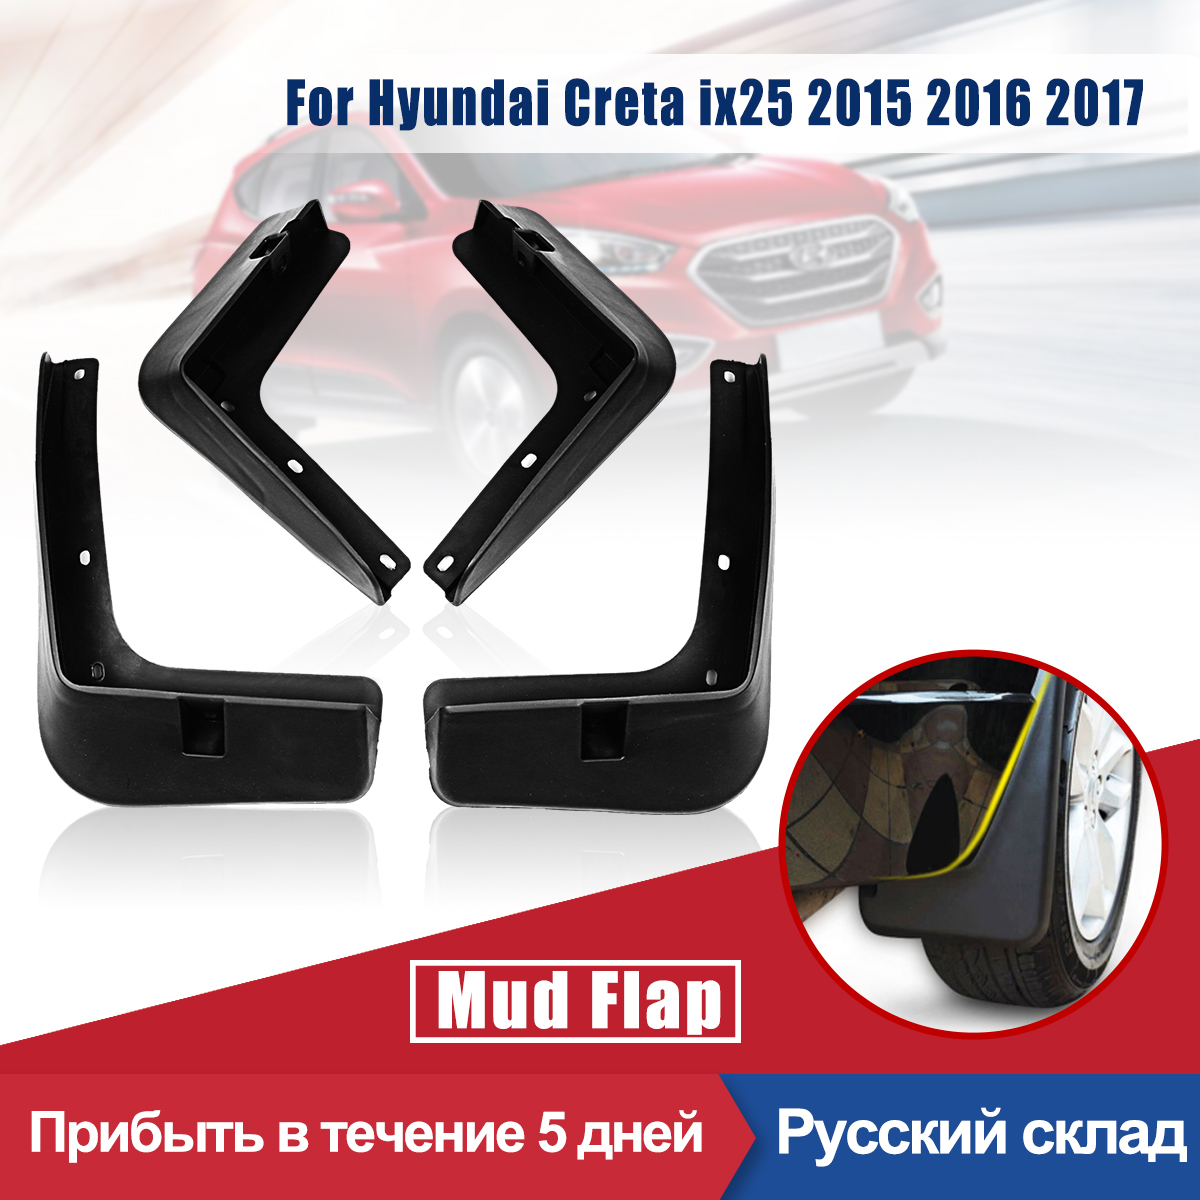 4 Pcs รถด้านหลัง Mudguards Splash Guards Fender Flares สำหรับ Hyundai Creta ix25 2015 2016 2017 2018